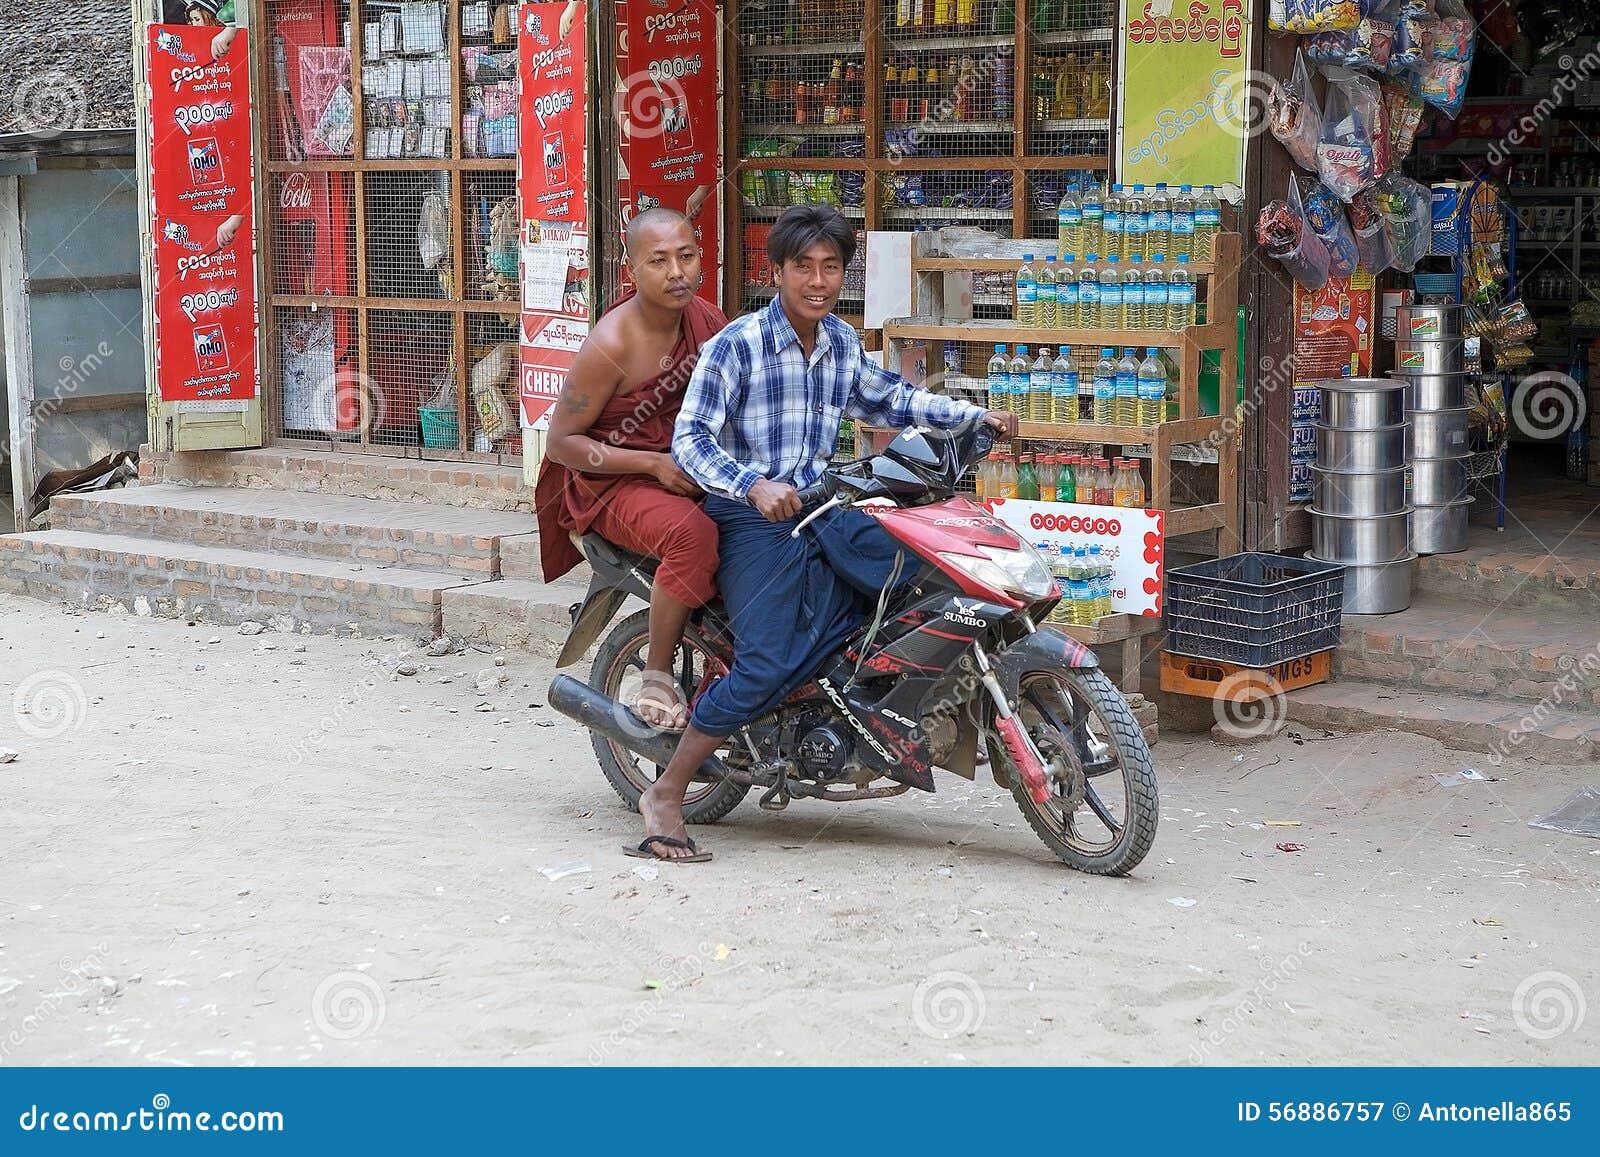 Monaco buddista sul motociclo Myanmar